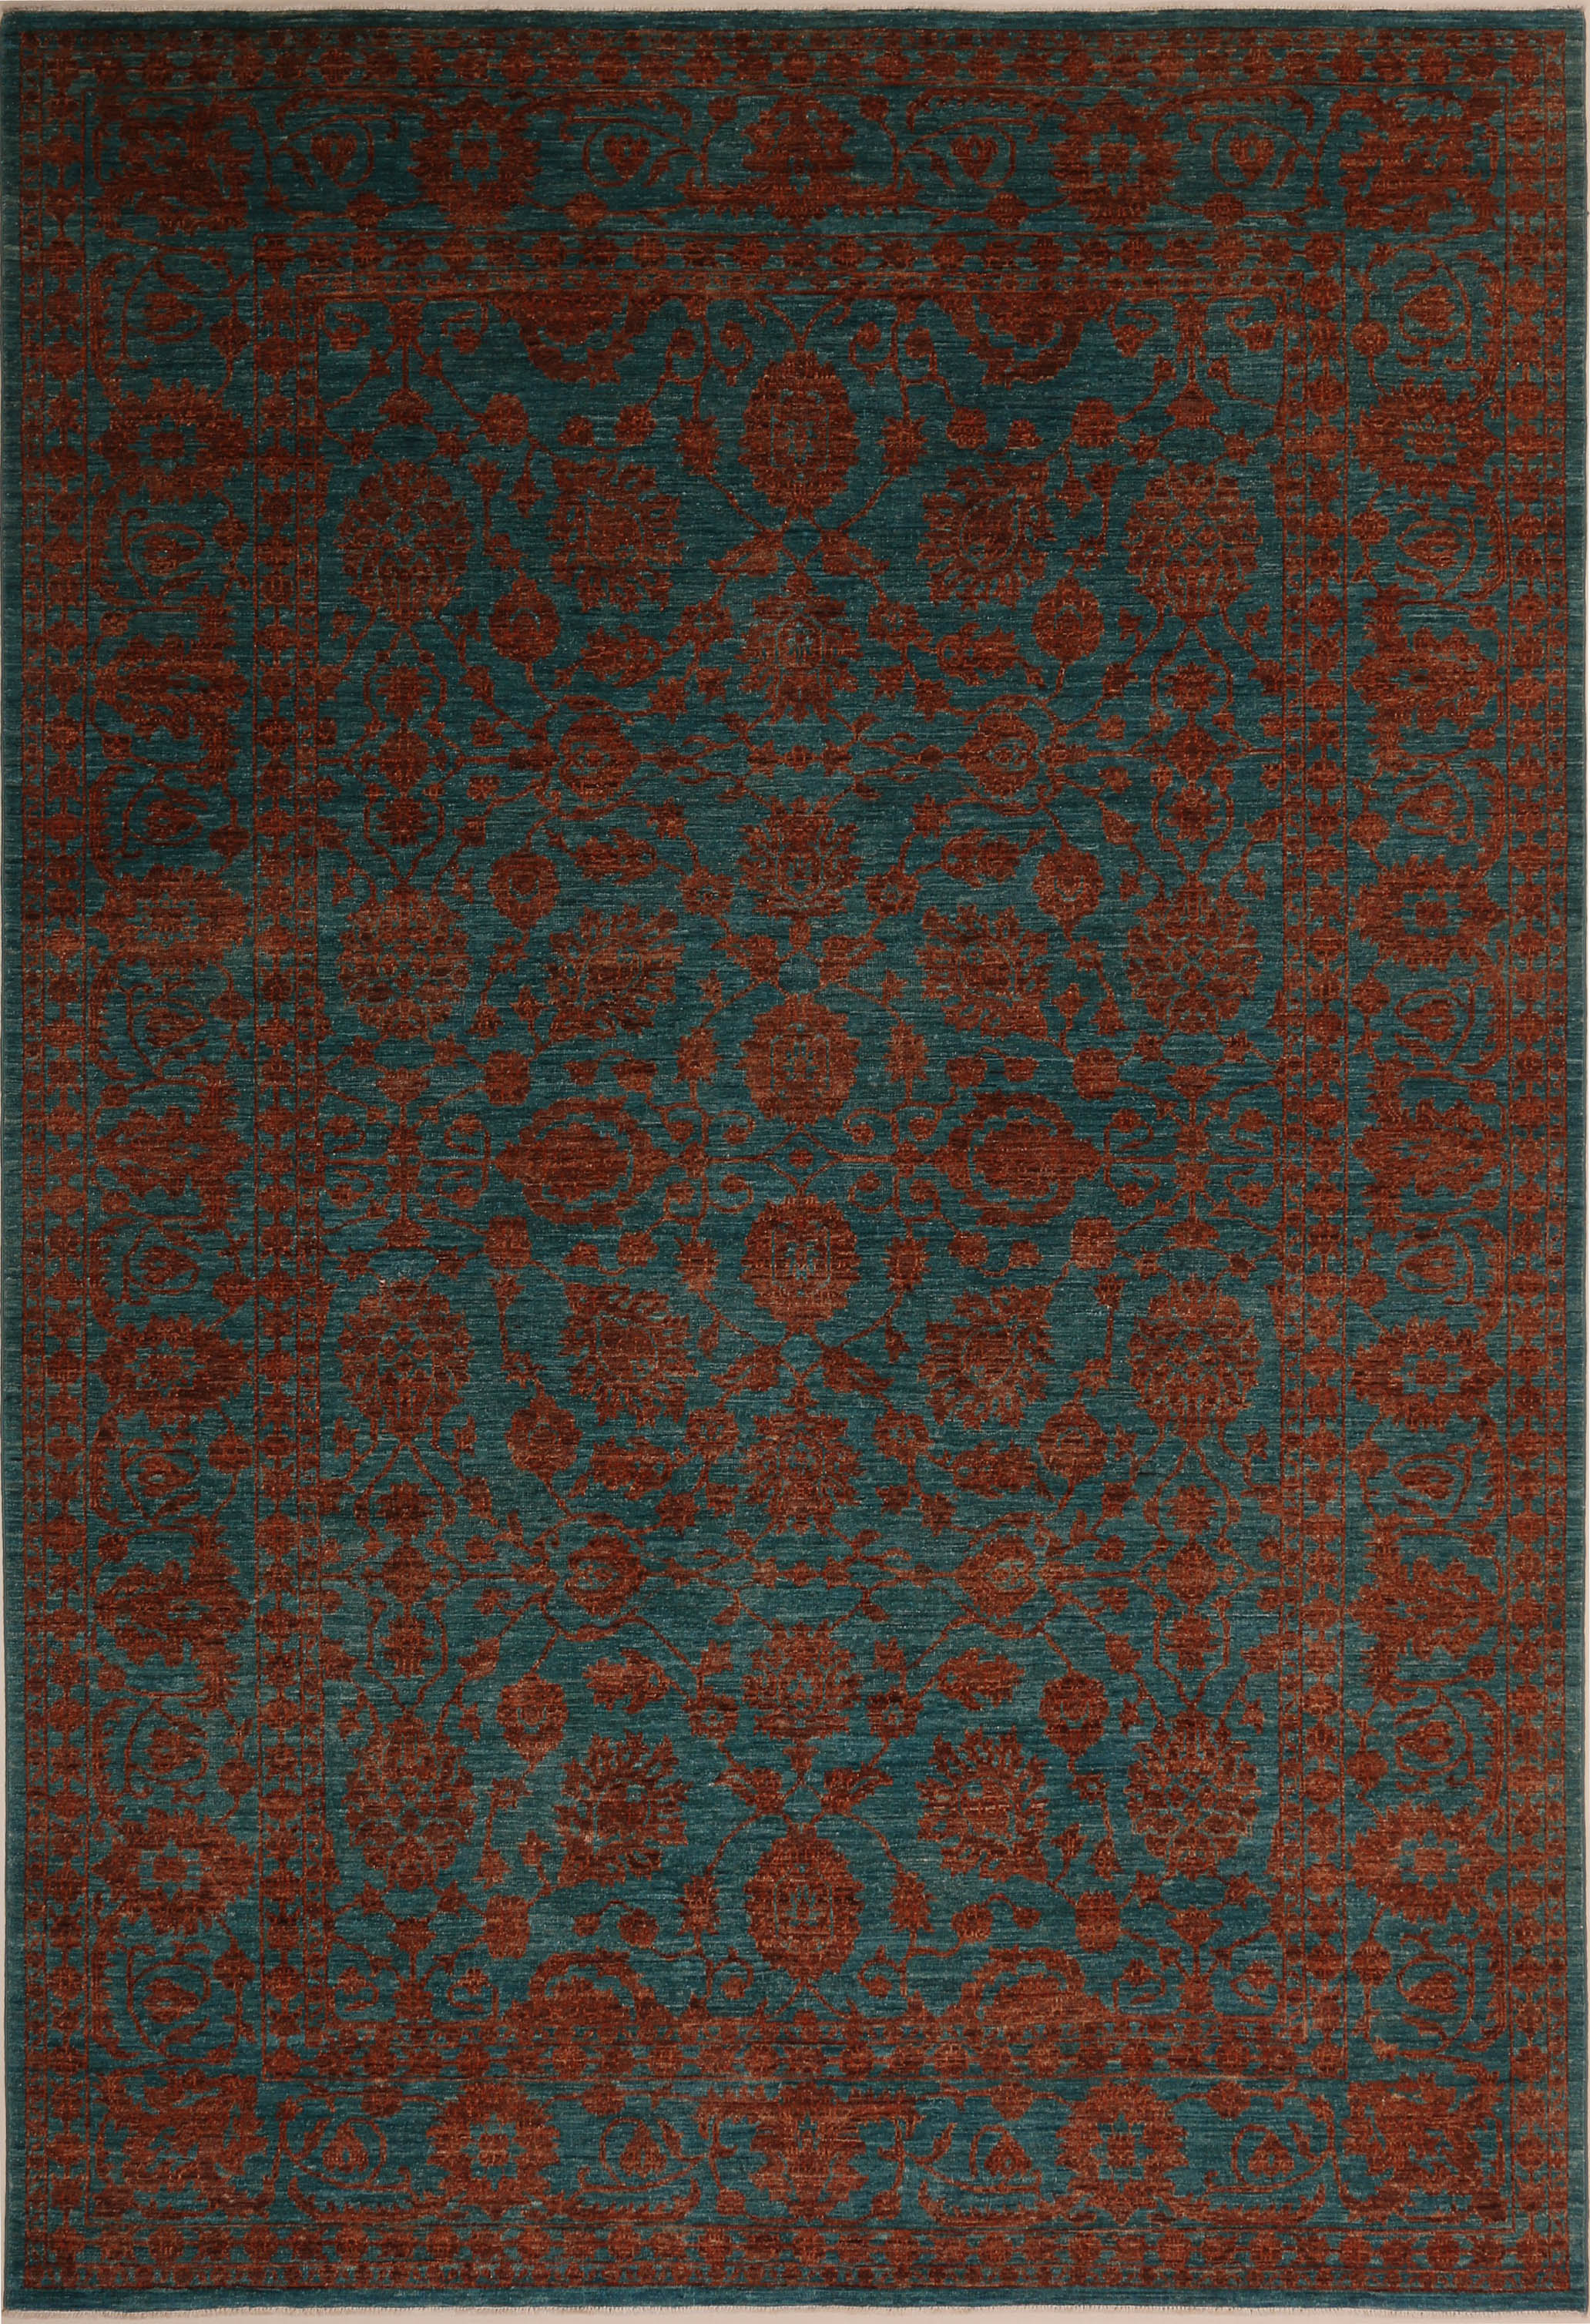 Vintage: nuova vita ai tappeti persiani